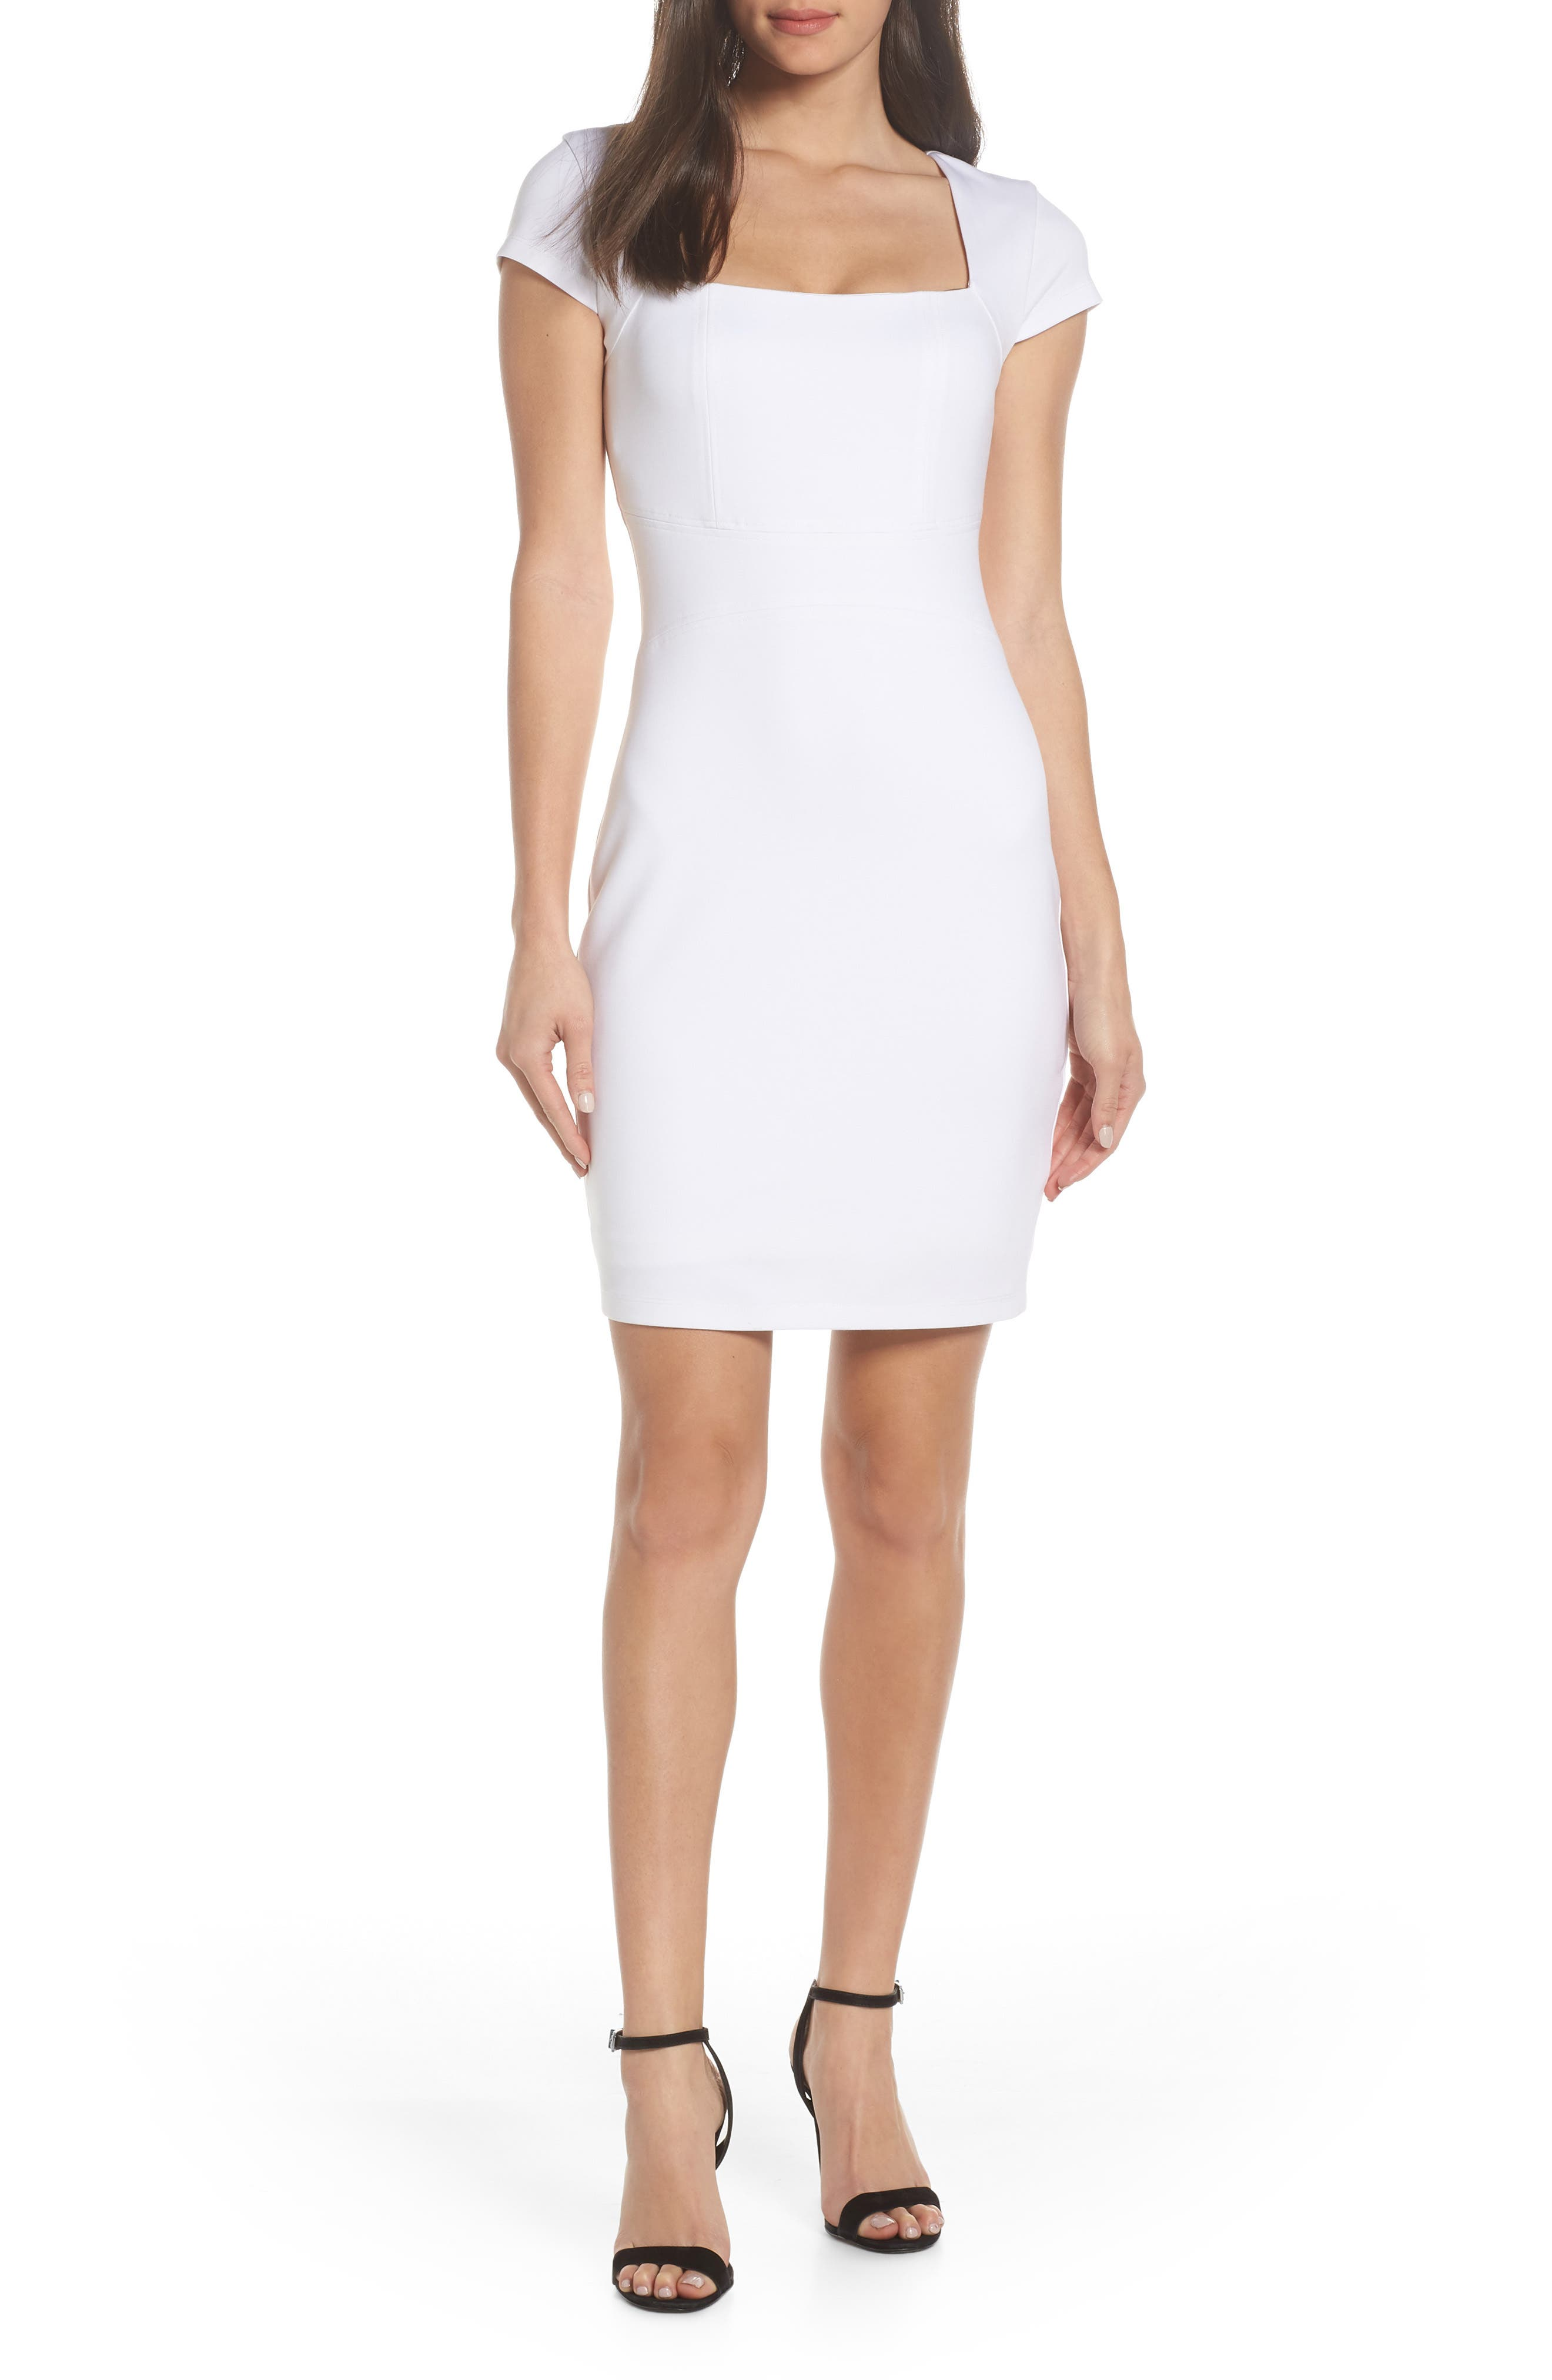 ALI & JAY, Olive Street Body-Con Dress, Main thumbnail 1, color, WHITE